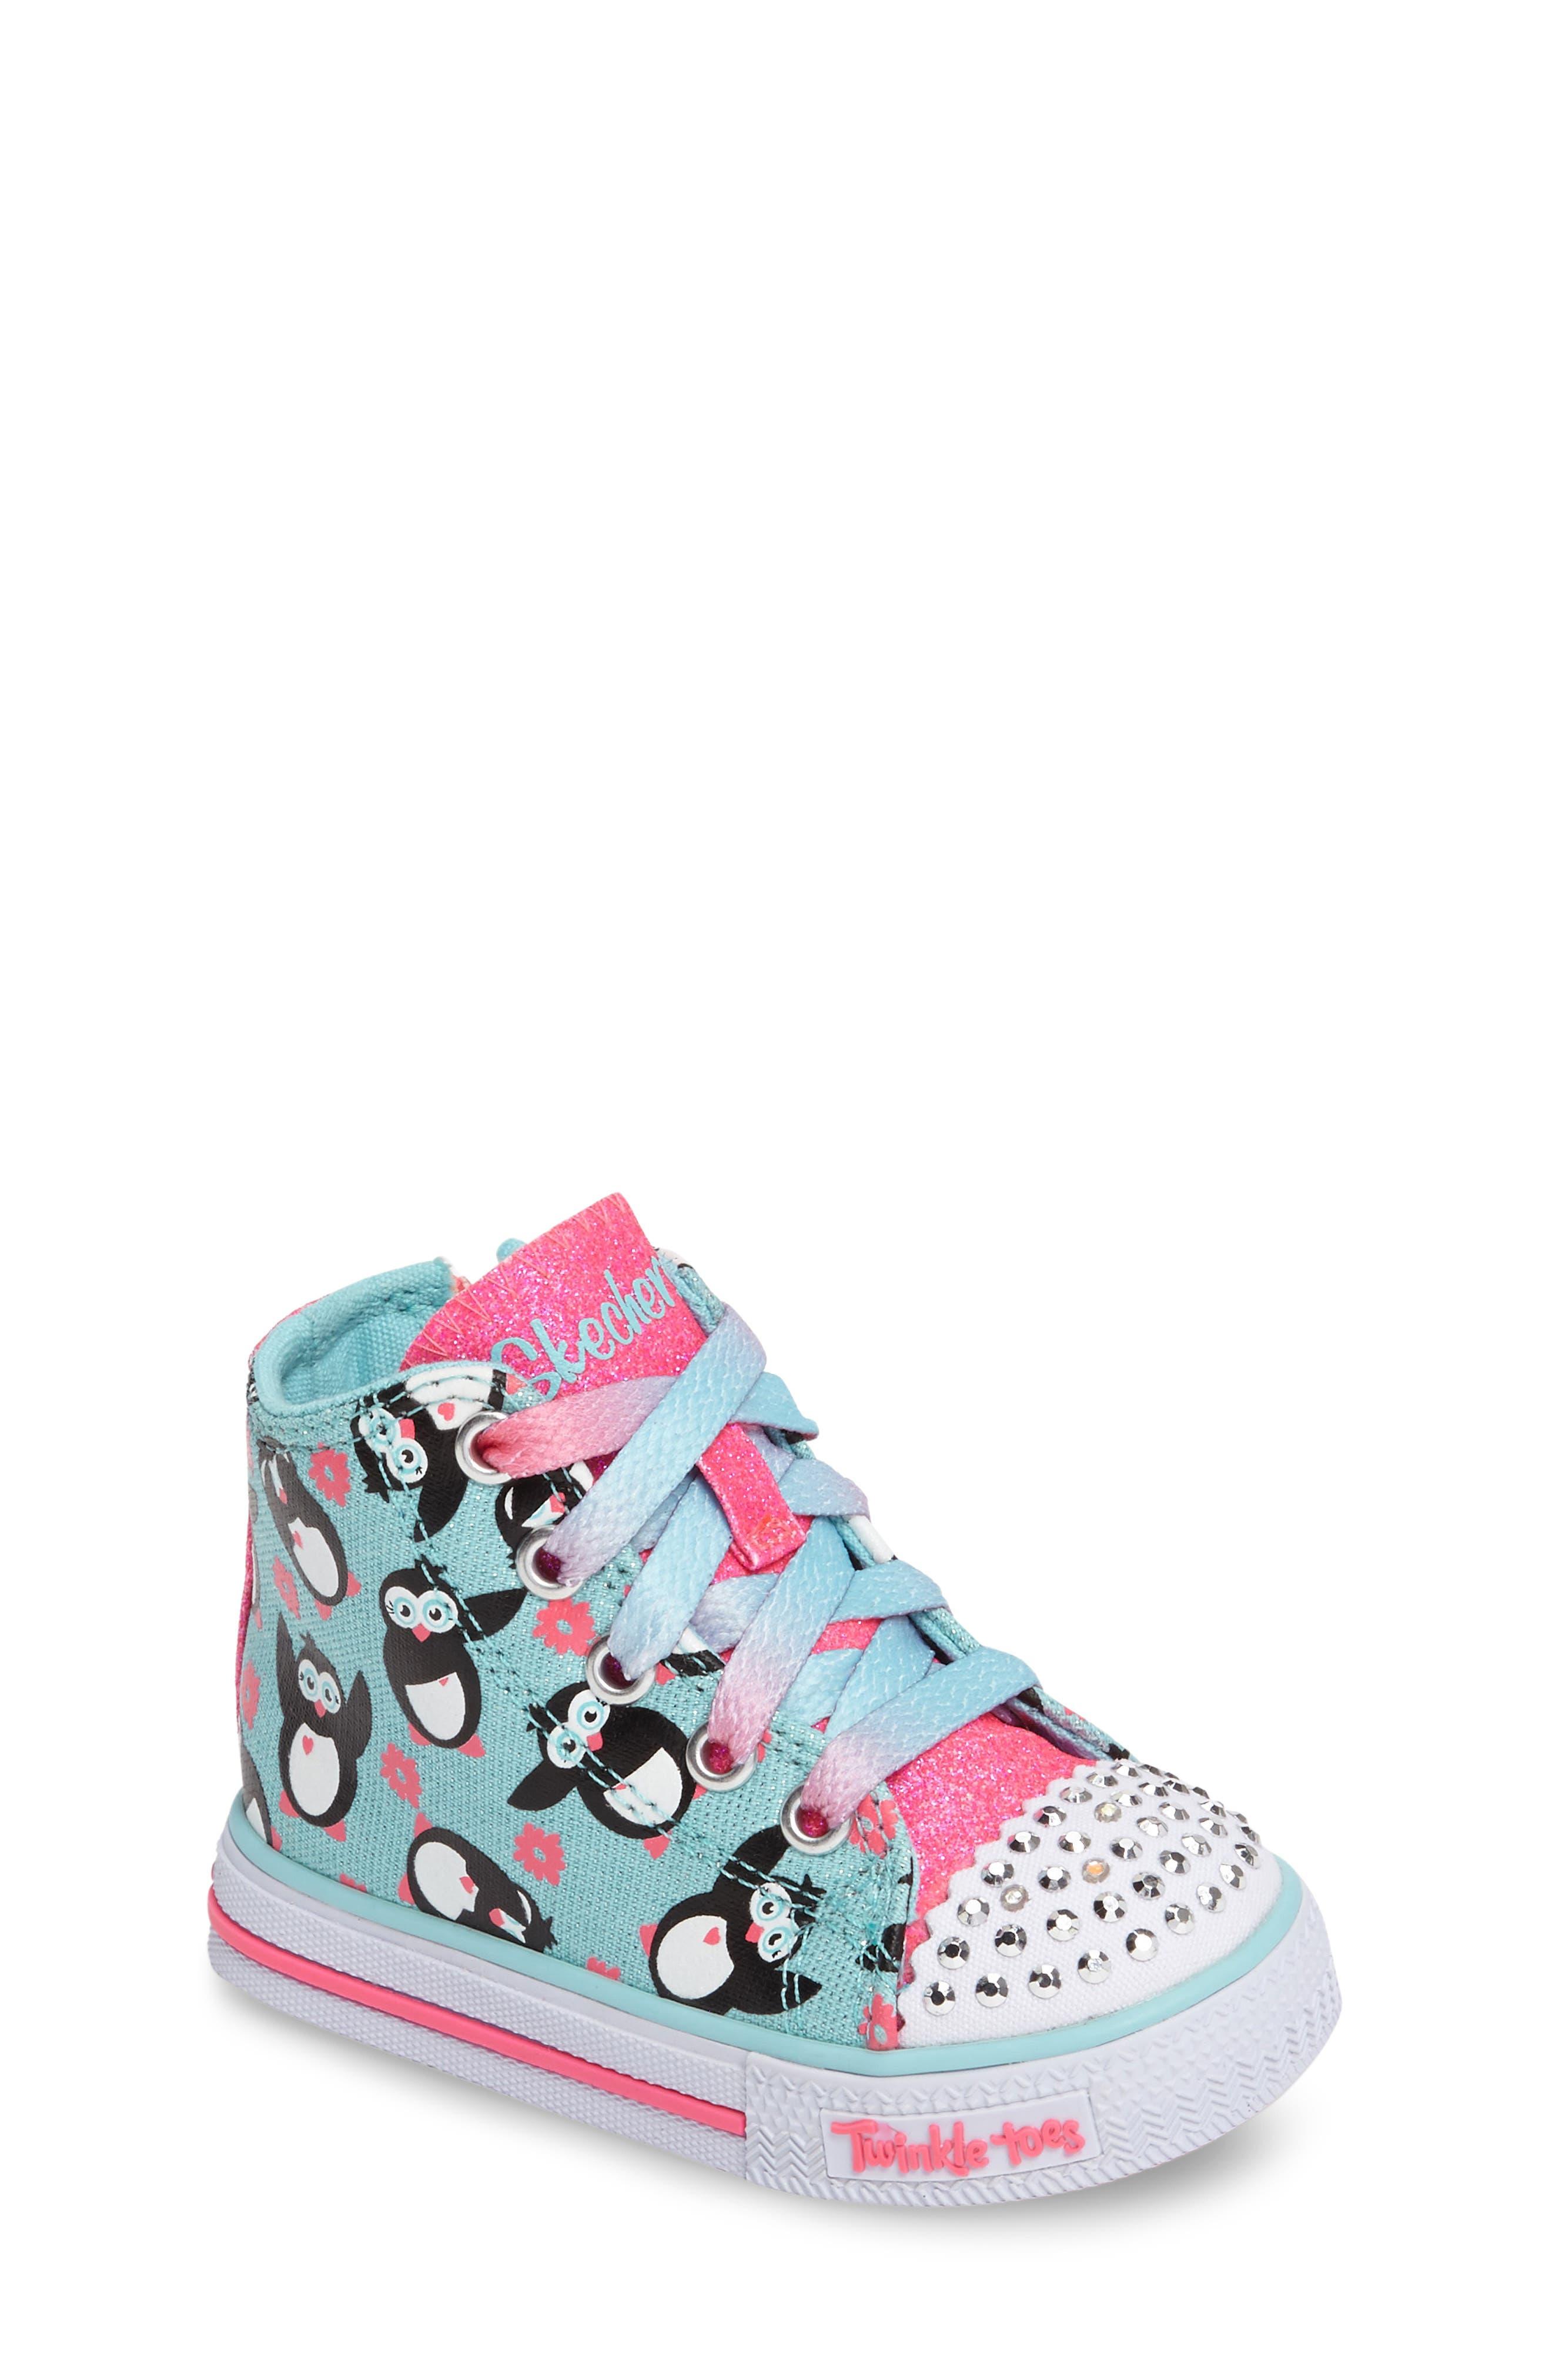 SKECHERS Twinkle Toes Shuffles Light-Up High Top Sneaker (Walker & Toddler)